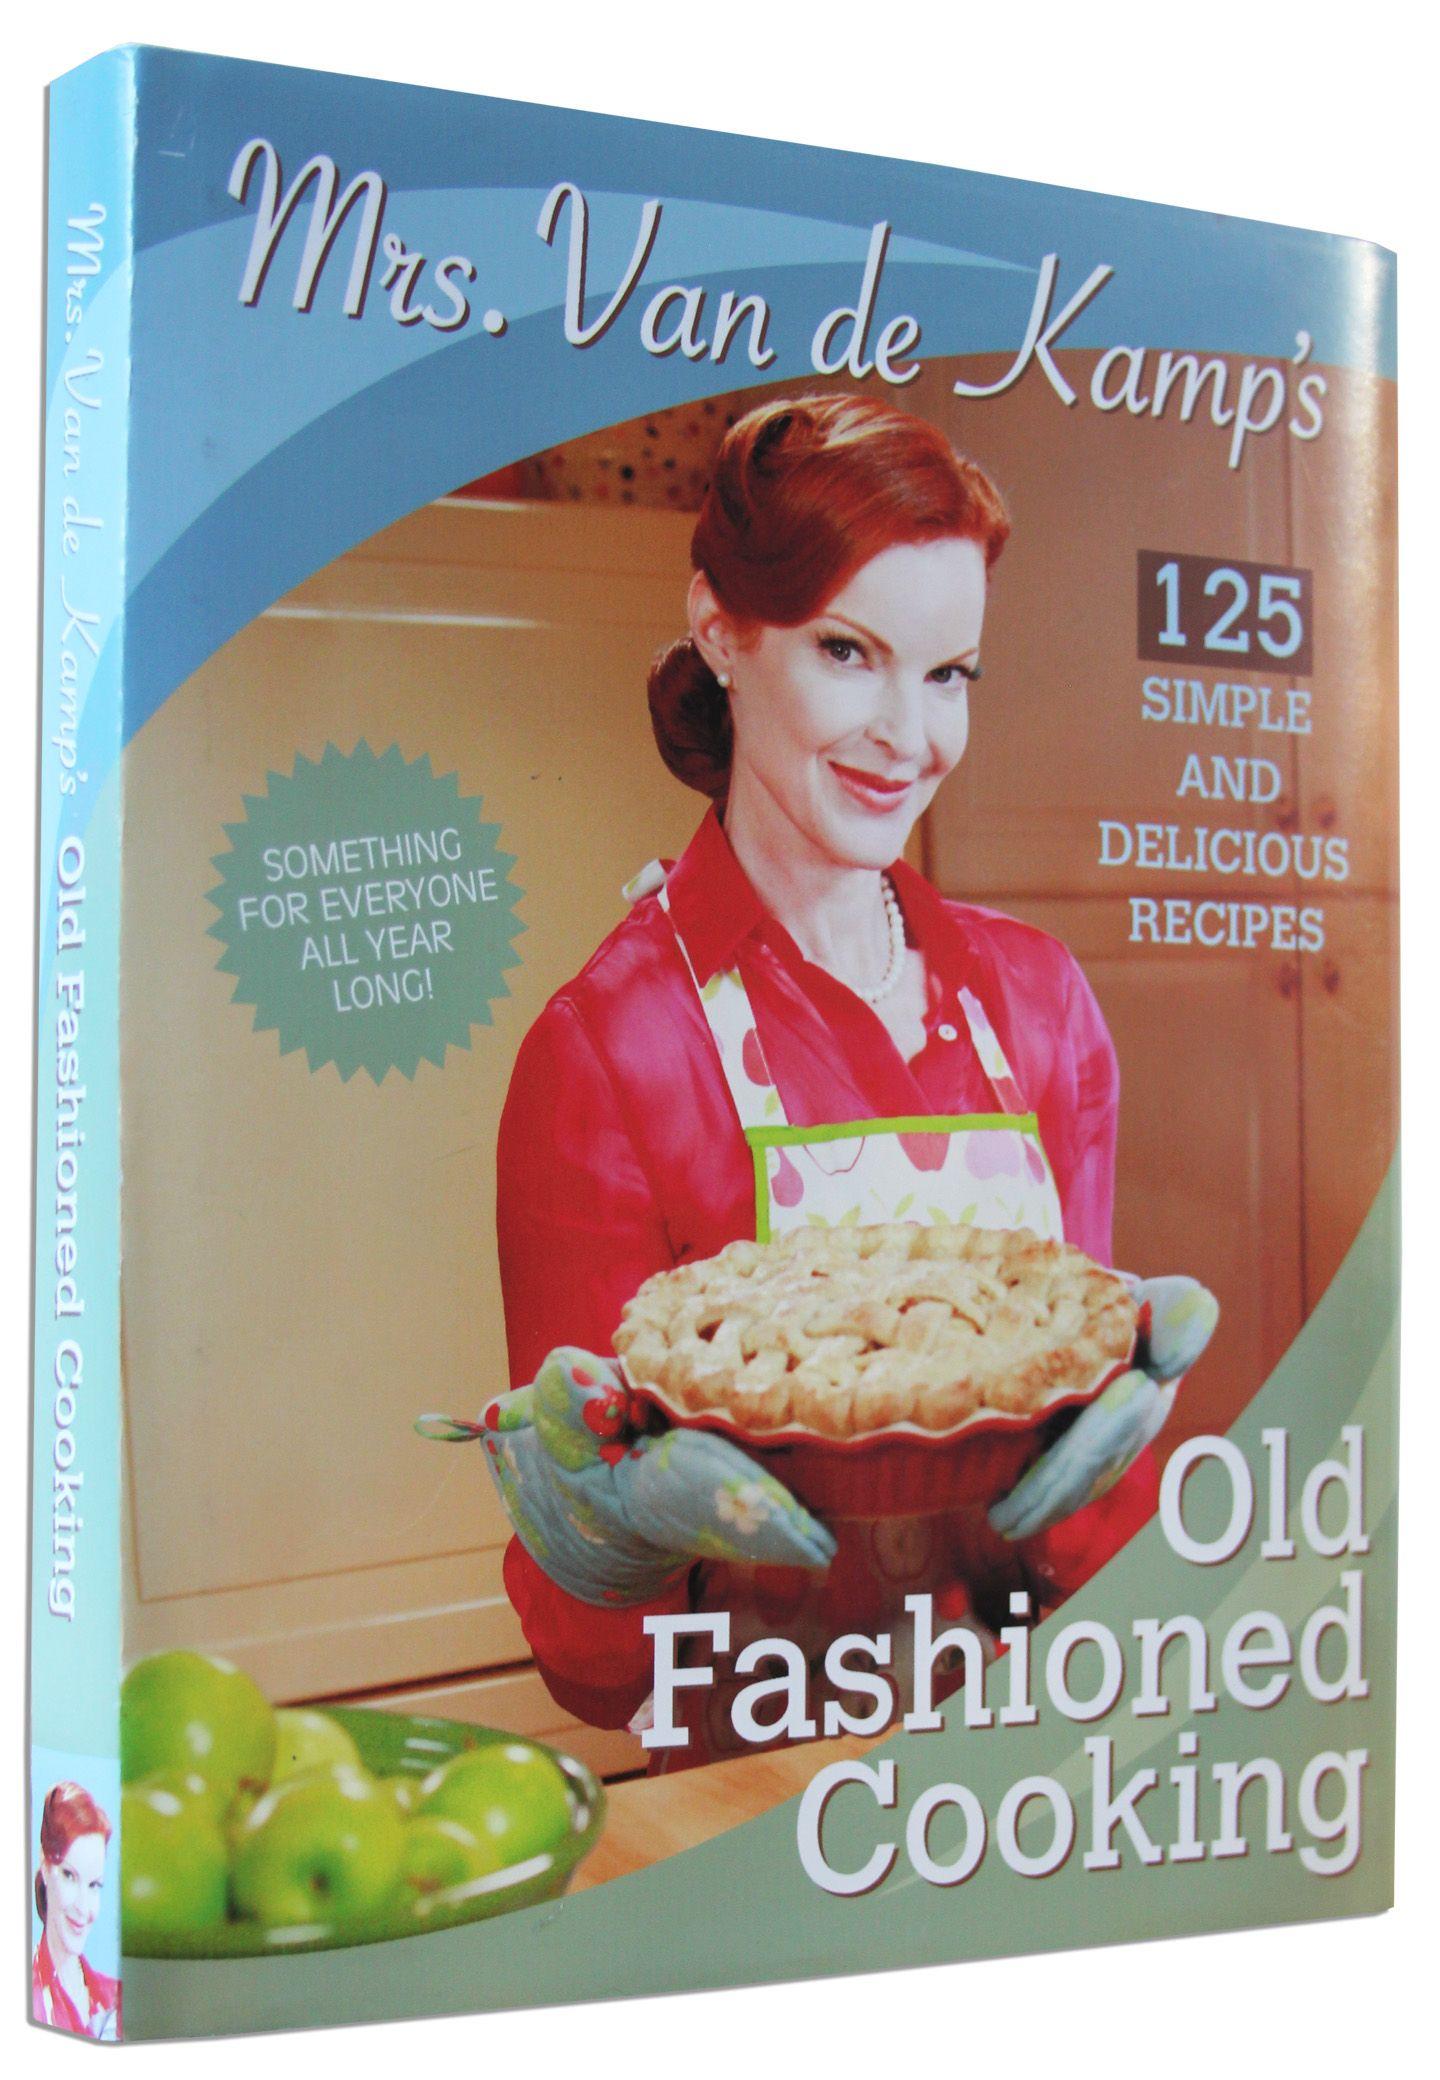 Fictional entrepreneurs - Bree Van De Kamp